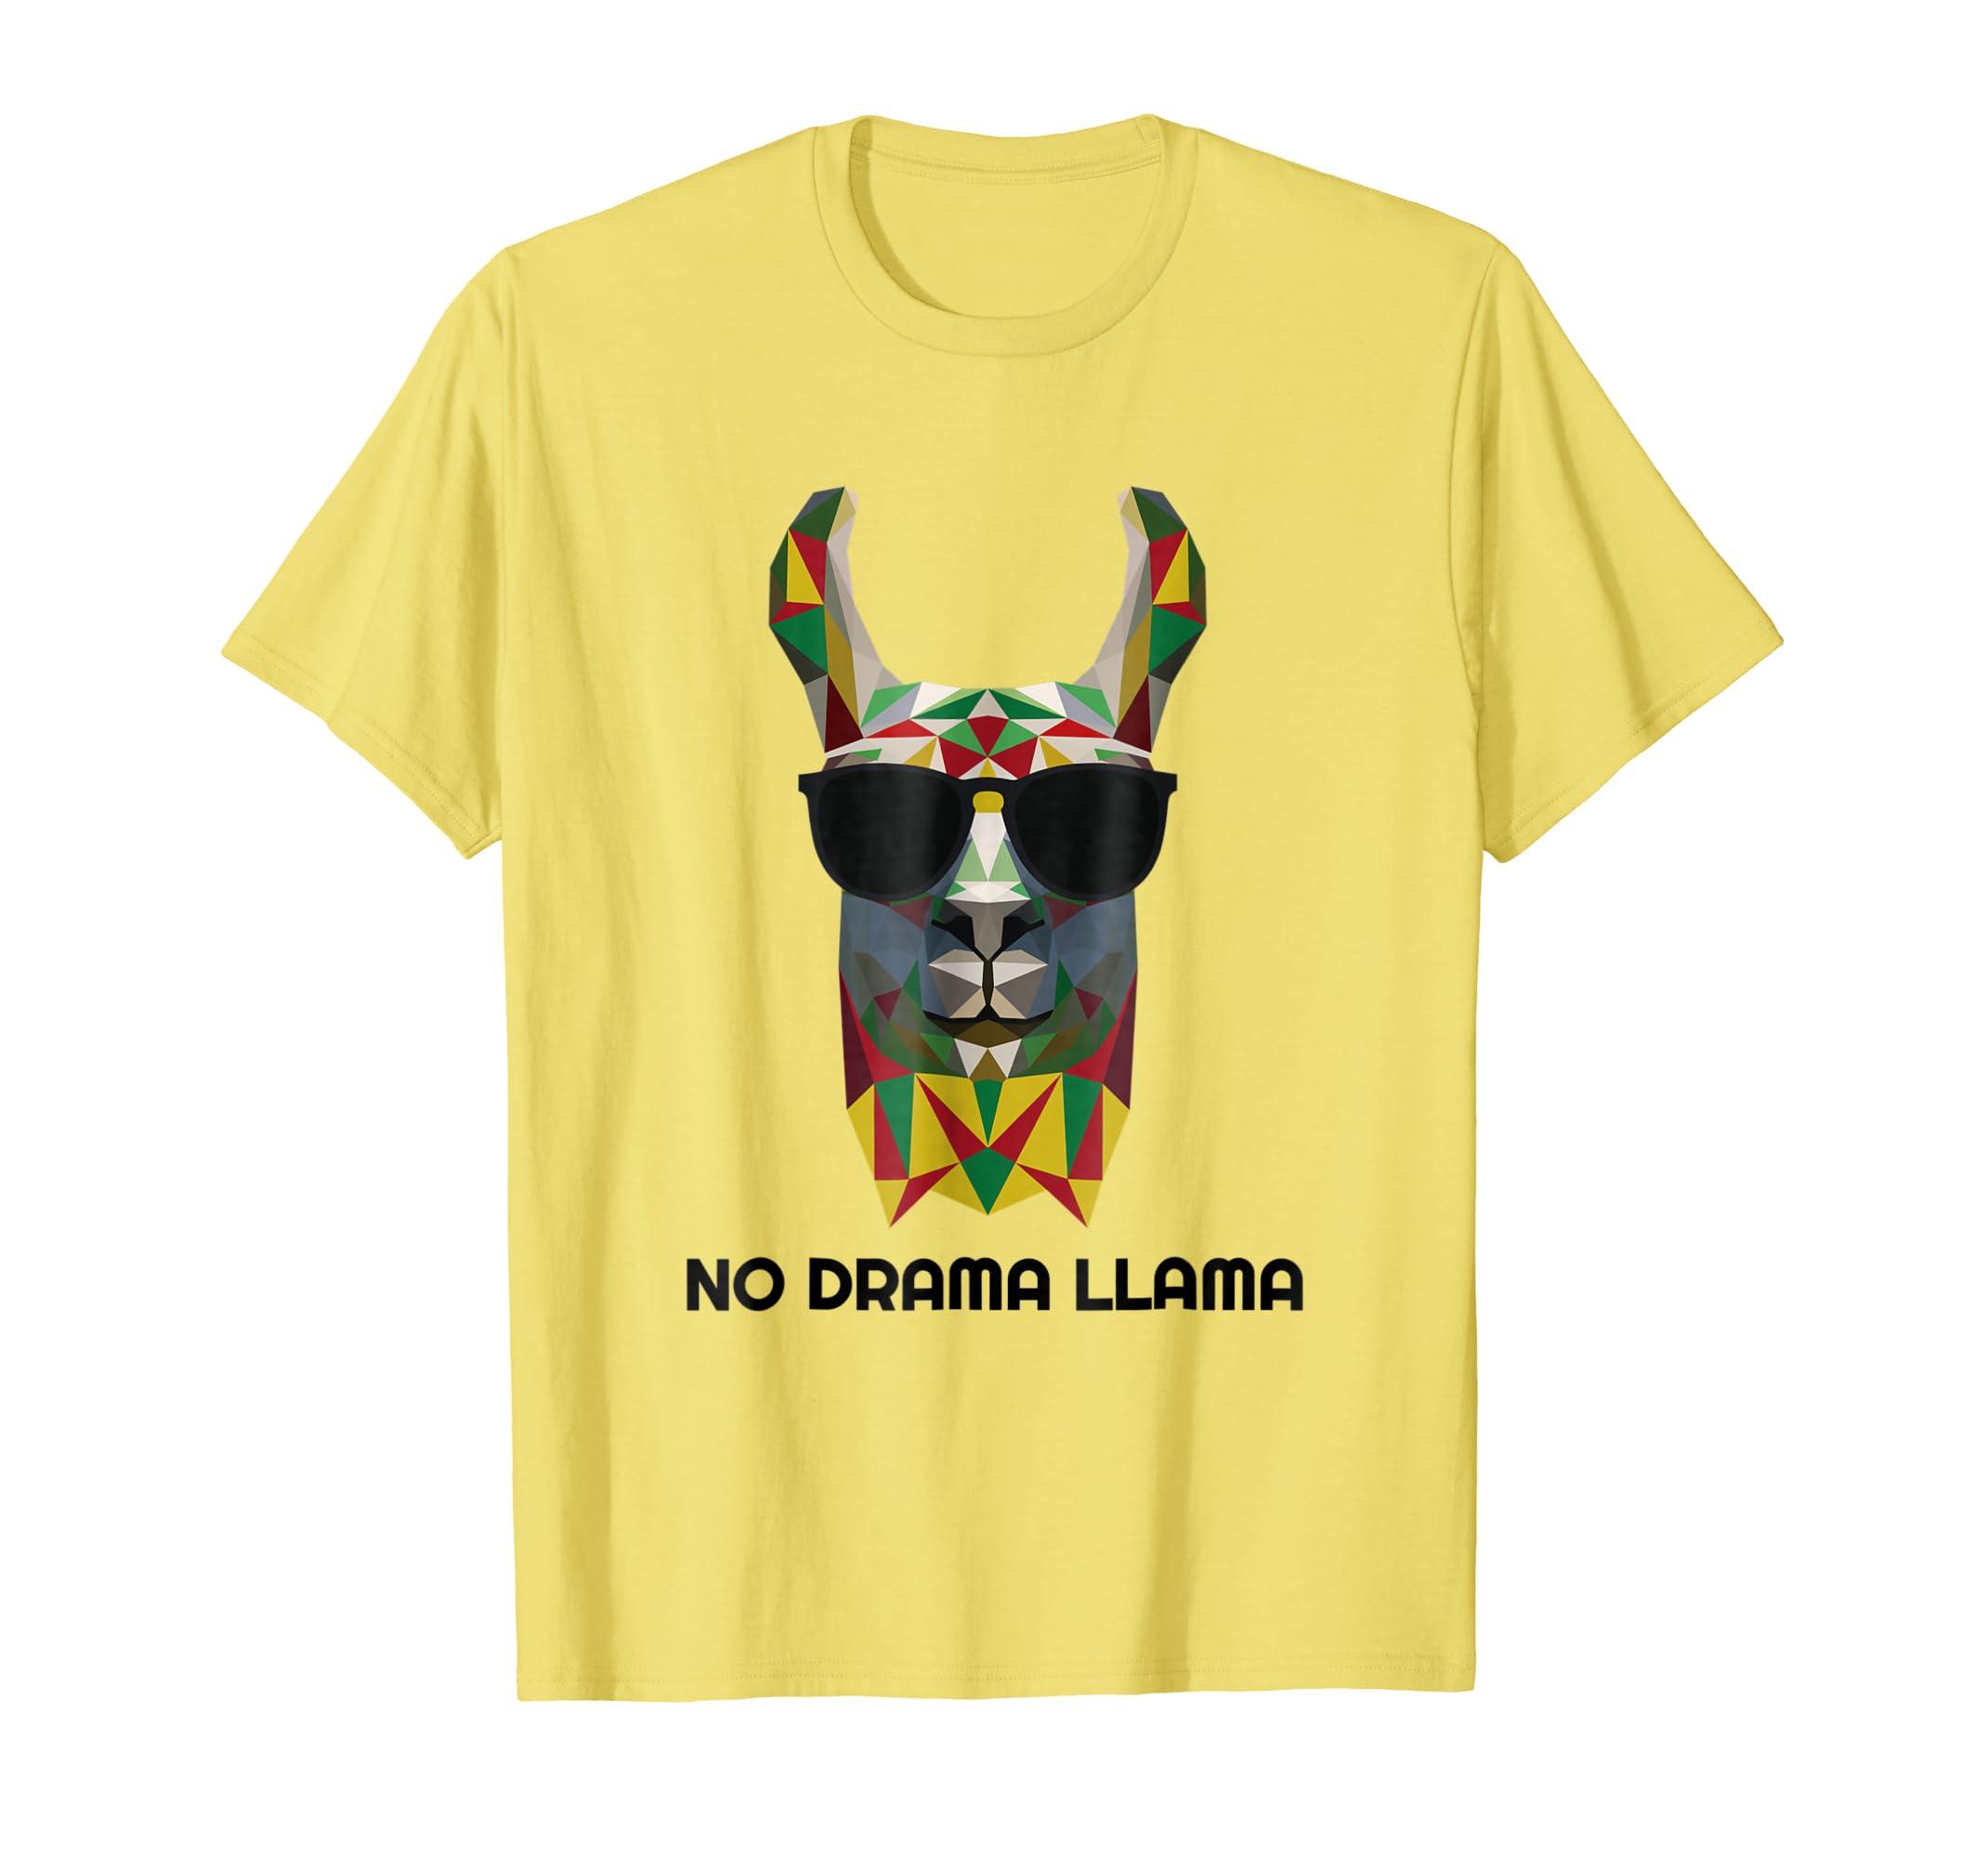 Llama Shirt No Drama Llama for Alpaca and Llama Lovers-SFL